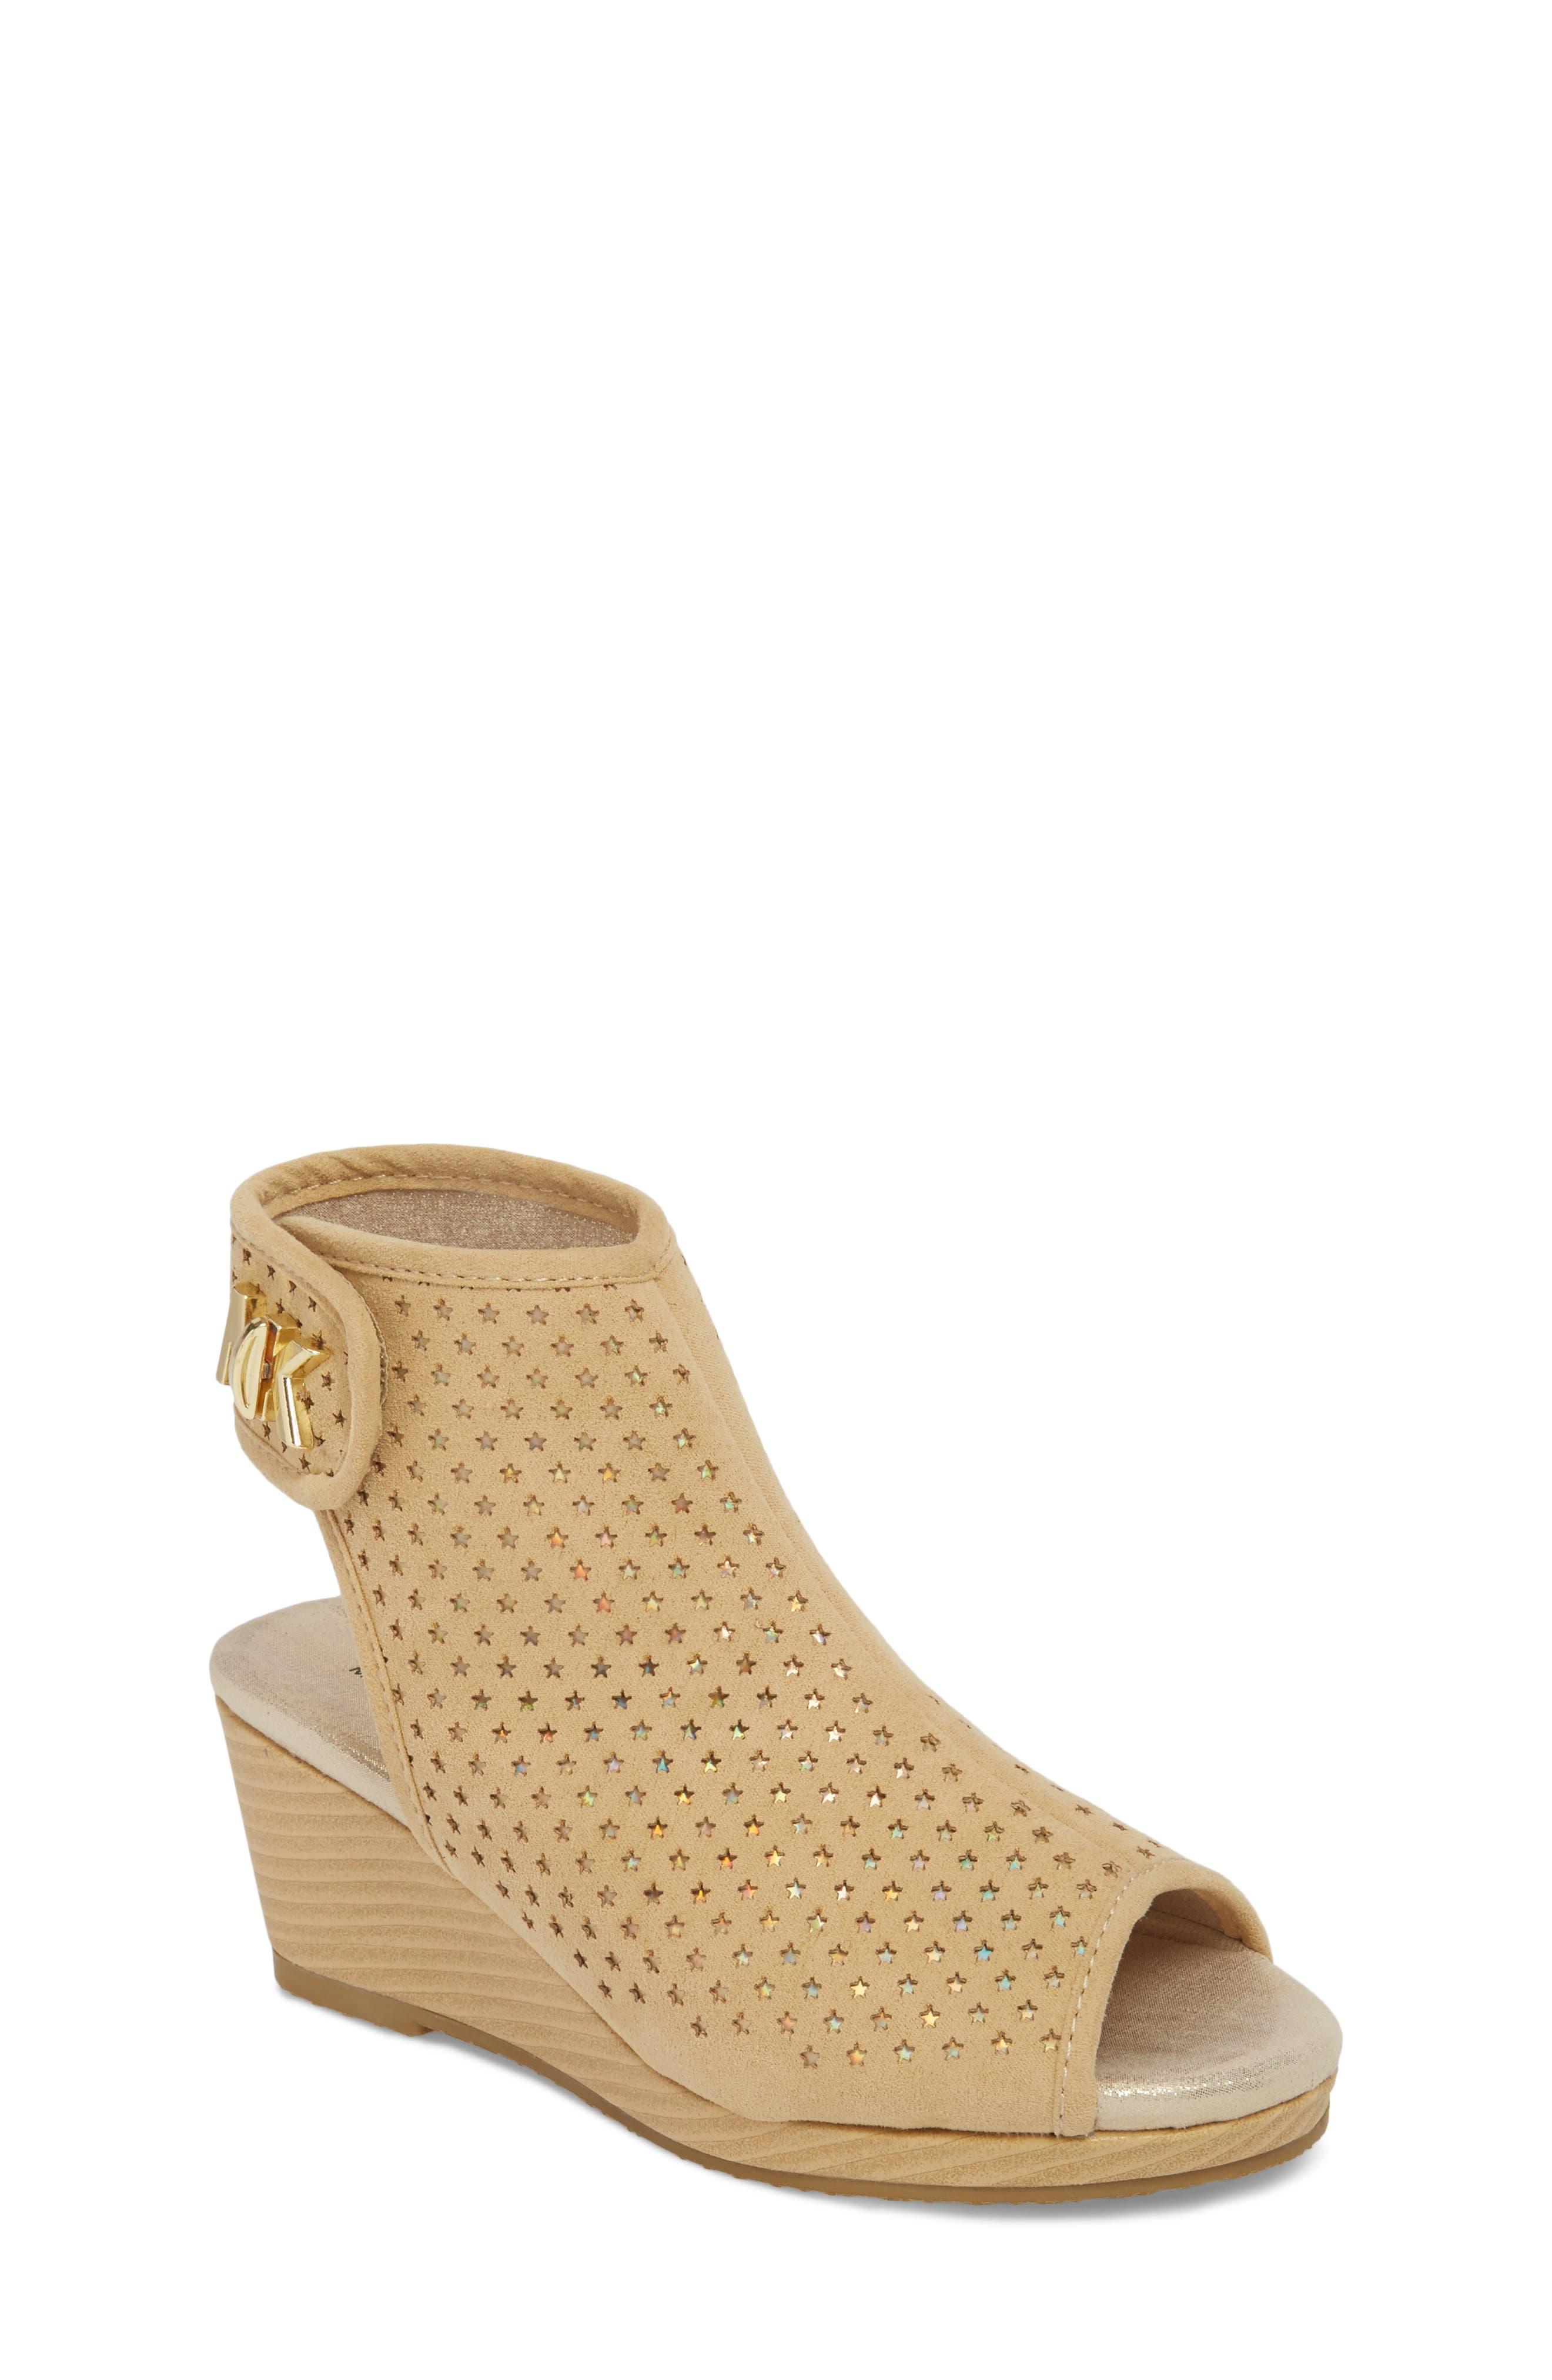 Cate Foe Wedge Sandal,                         Main,                         color, Sand